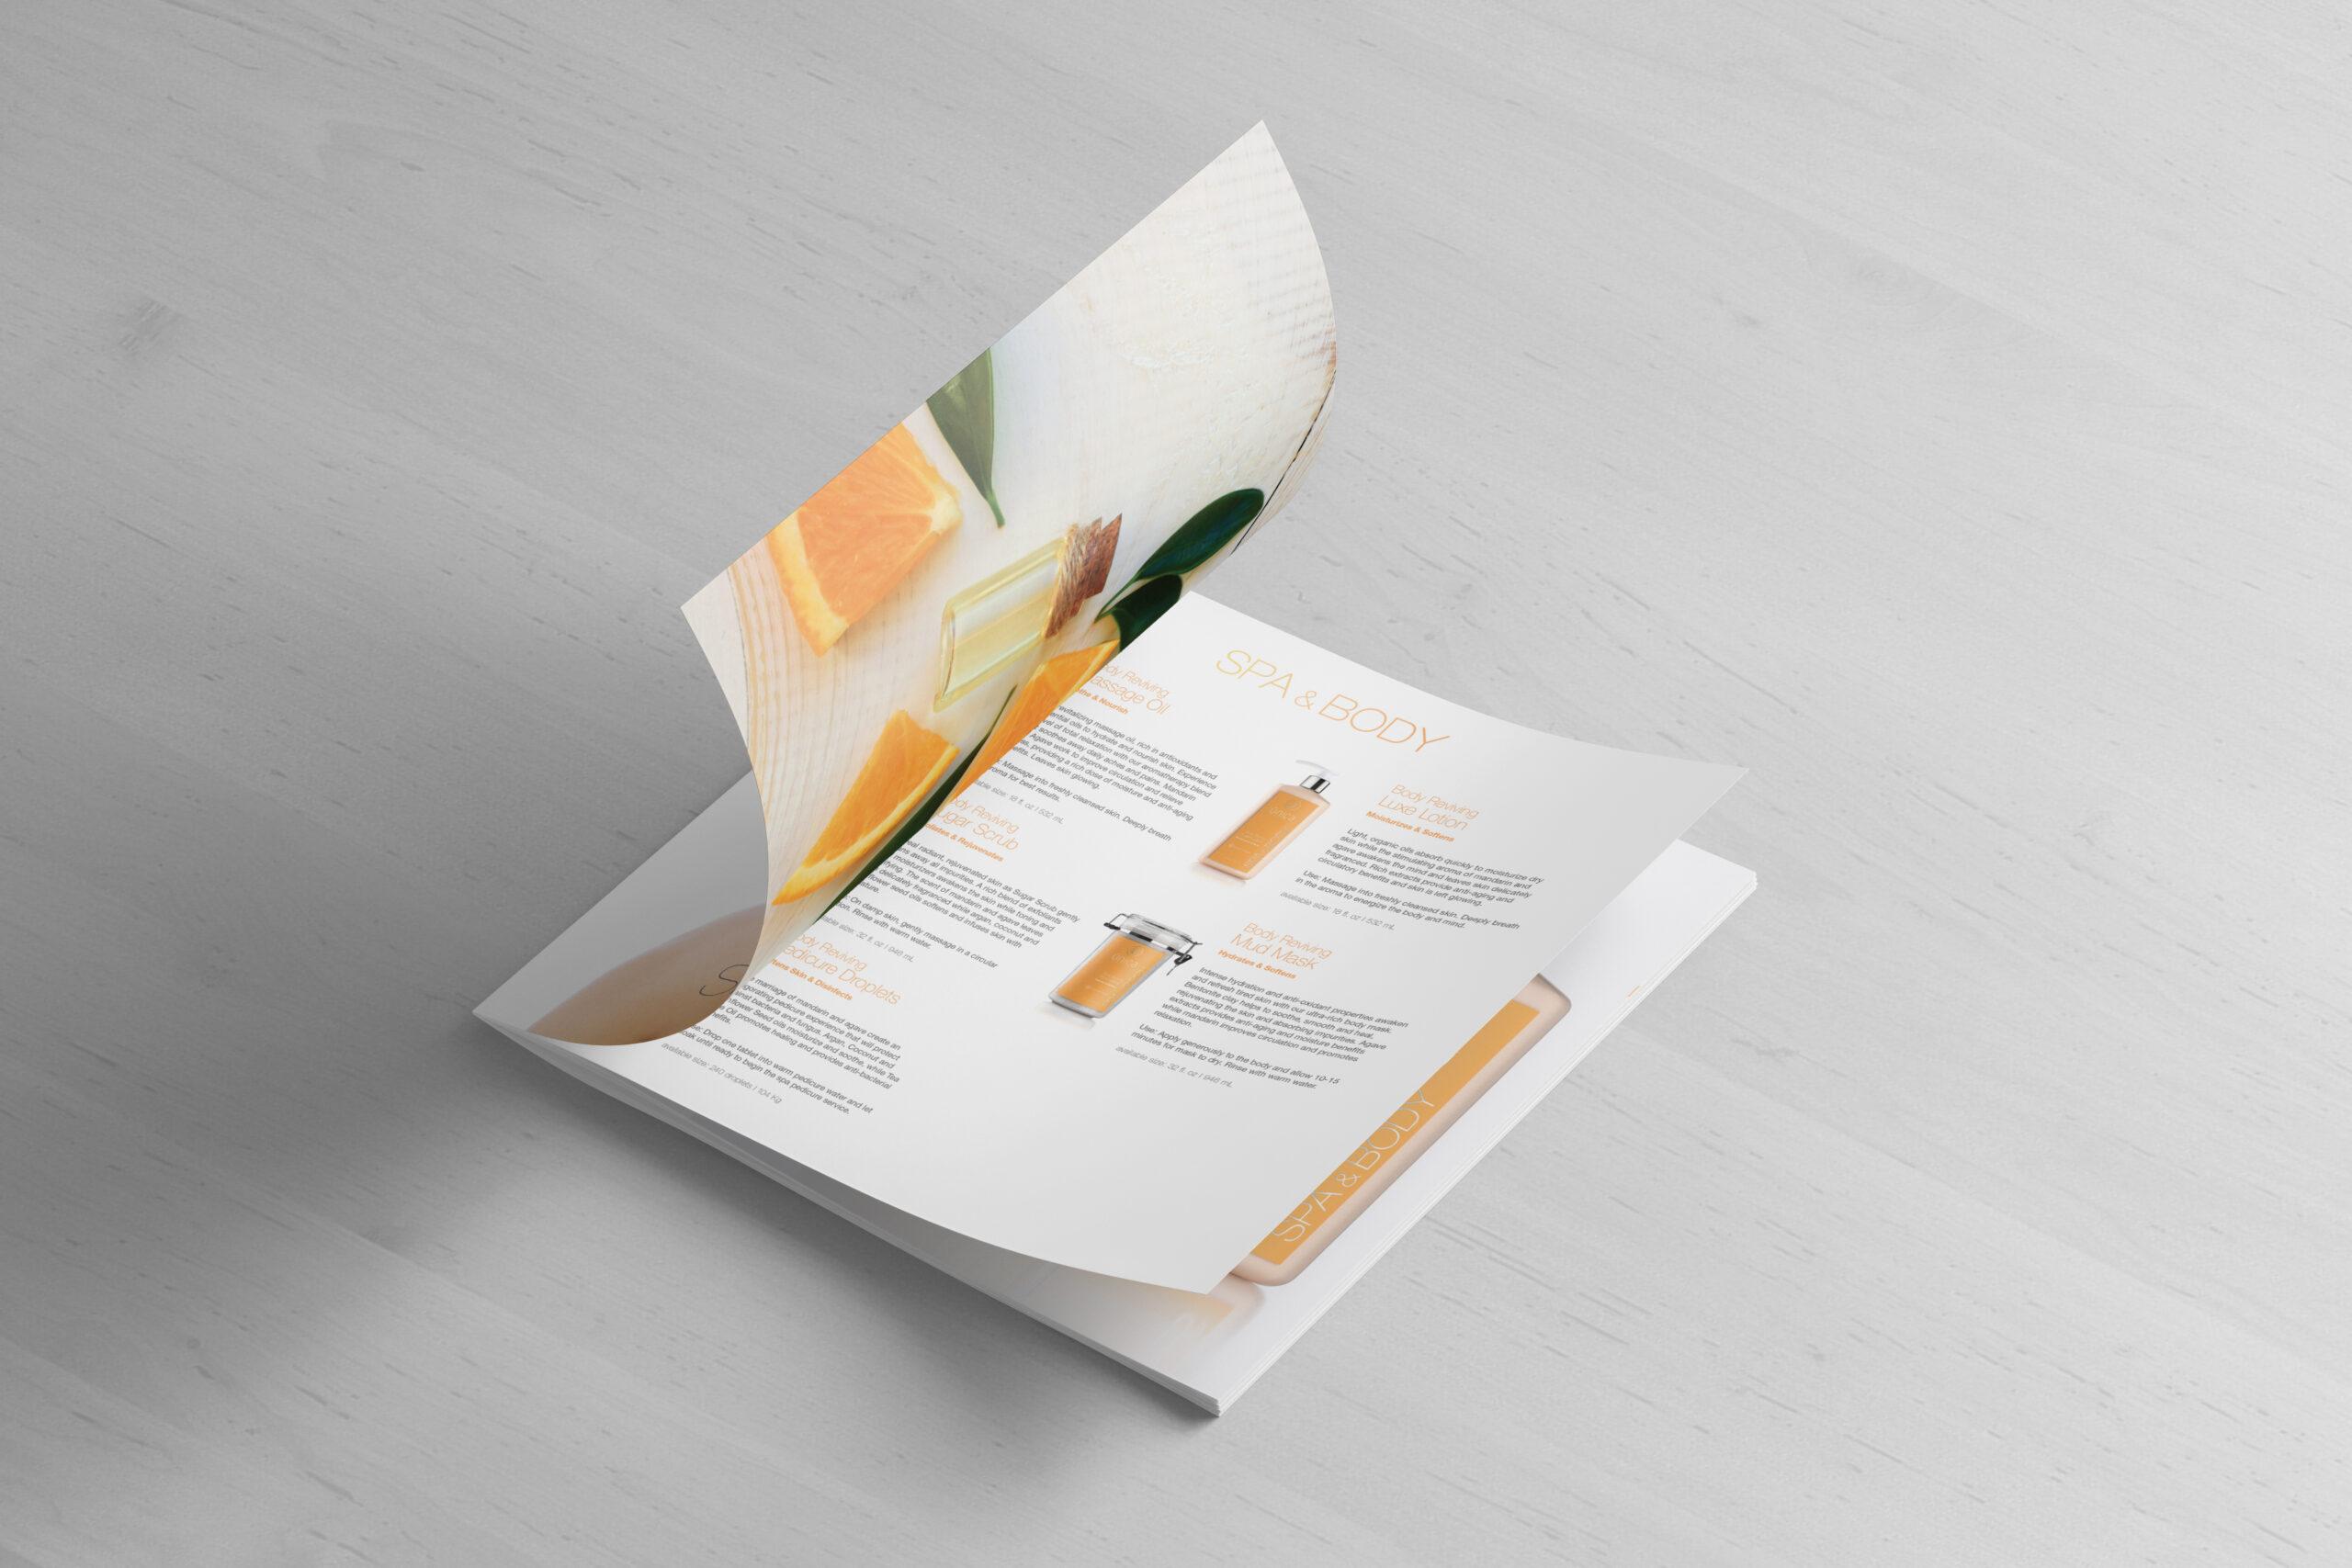 BCG_Portfolio_UnicaSpaBody_BrochureSpread_05